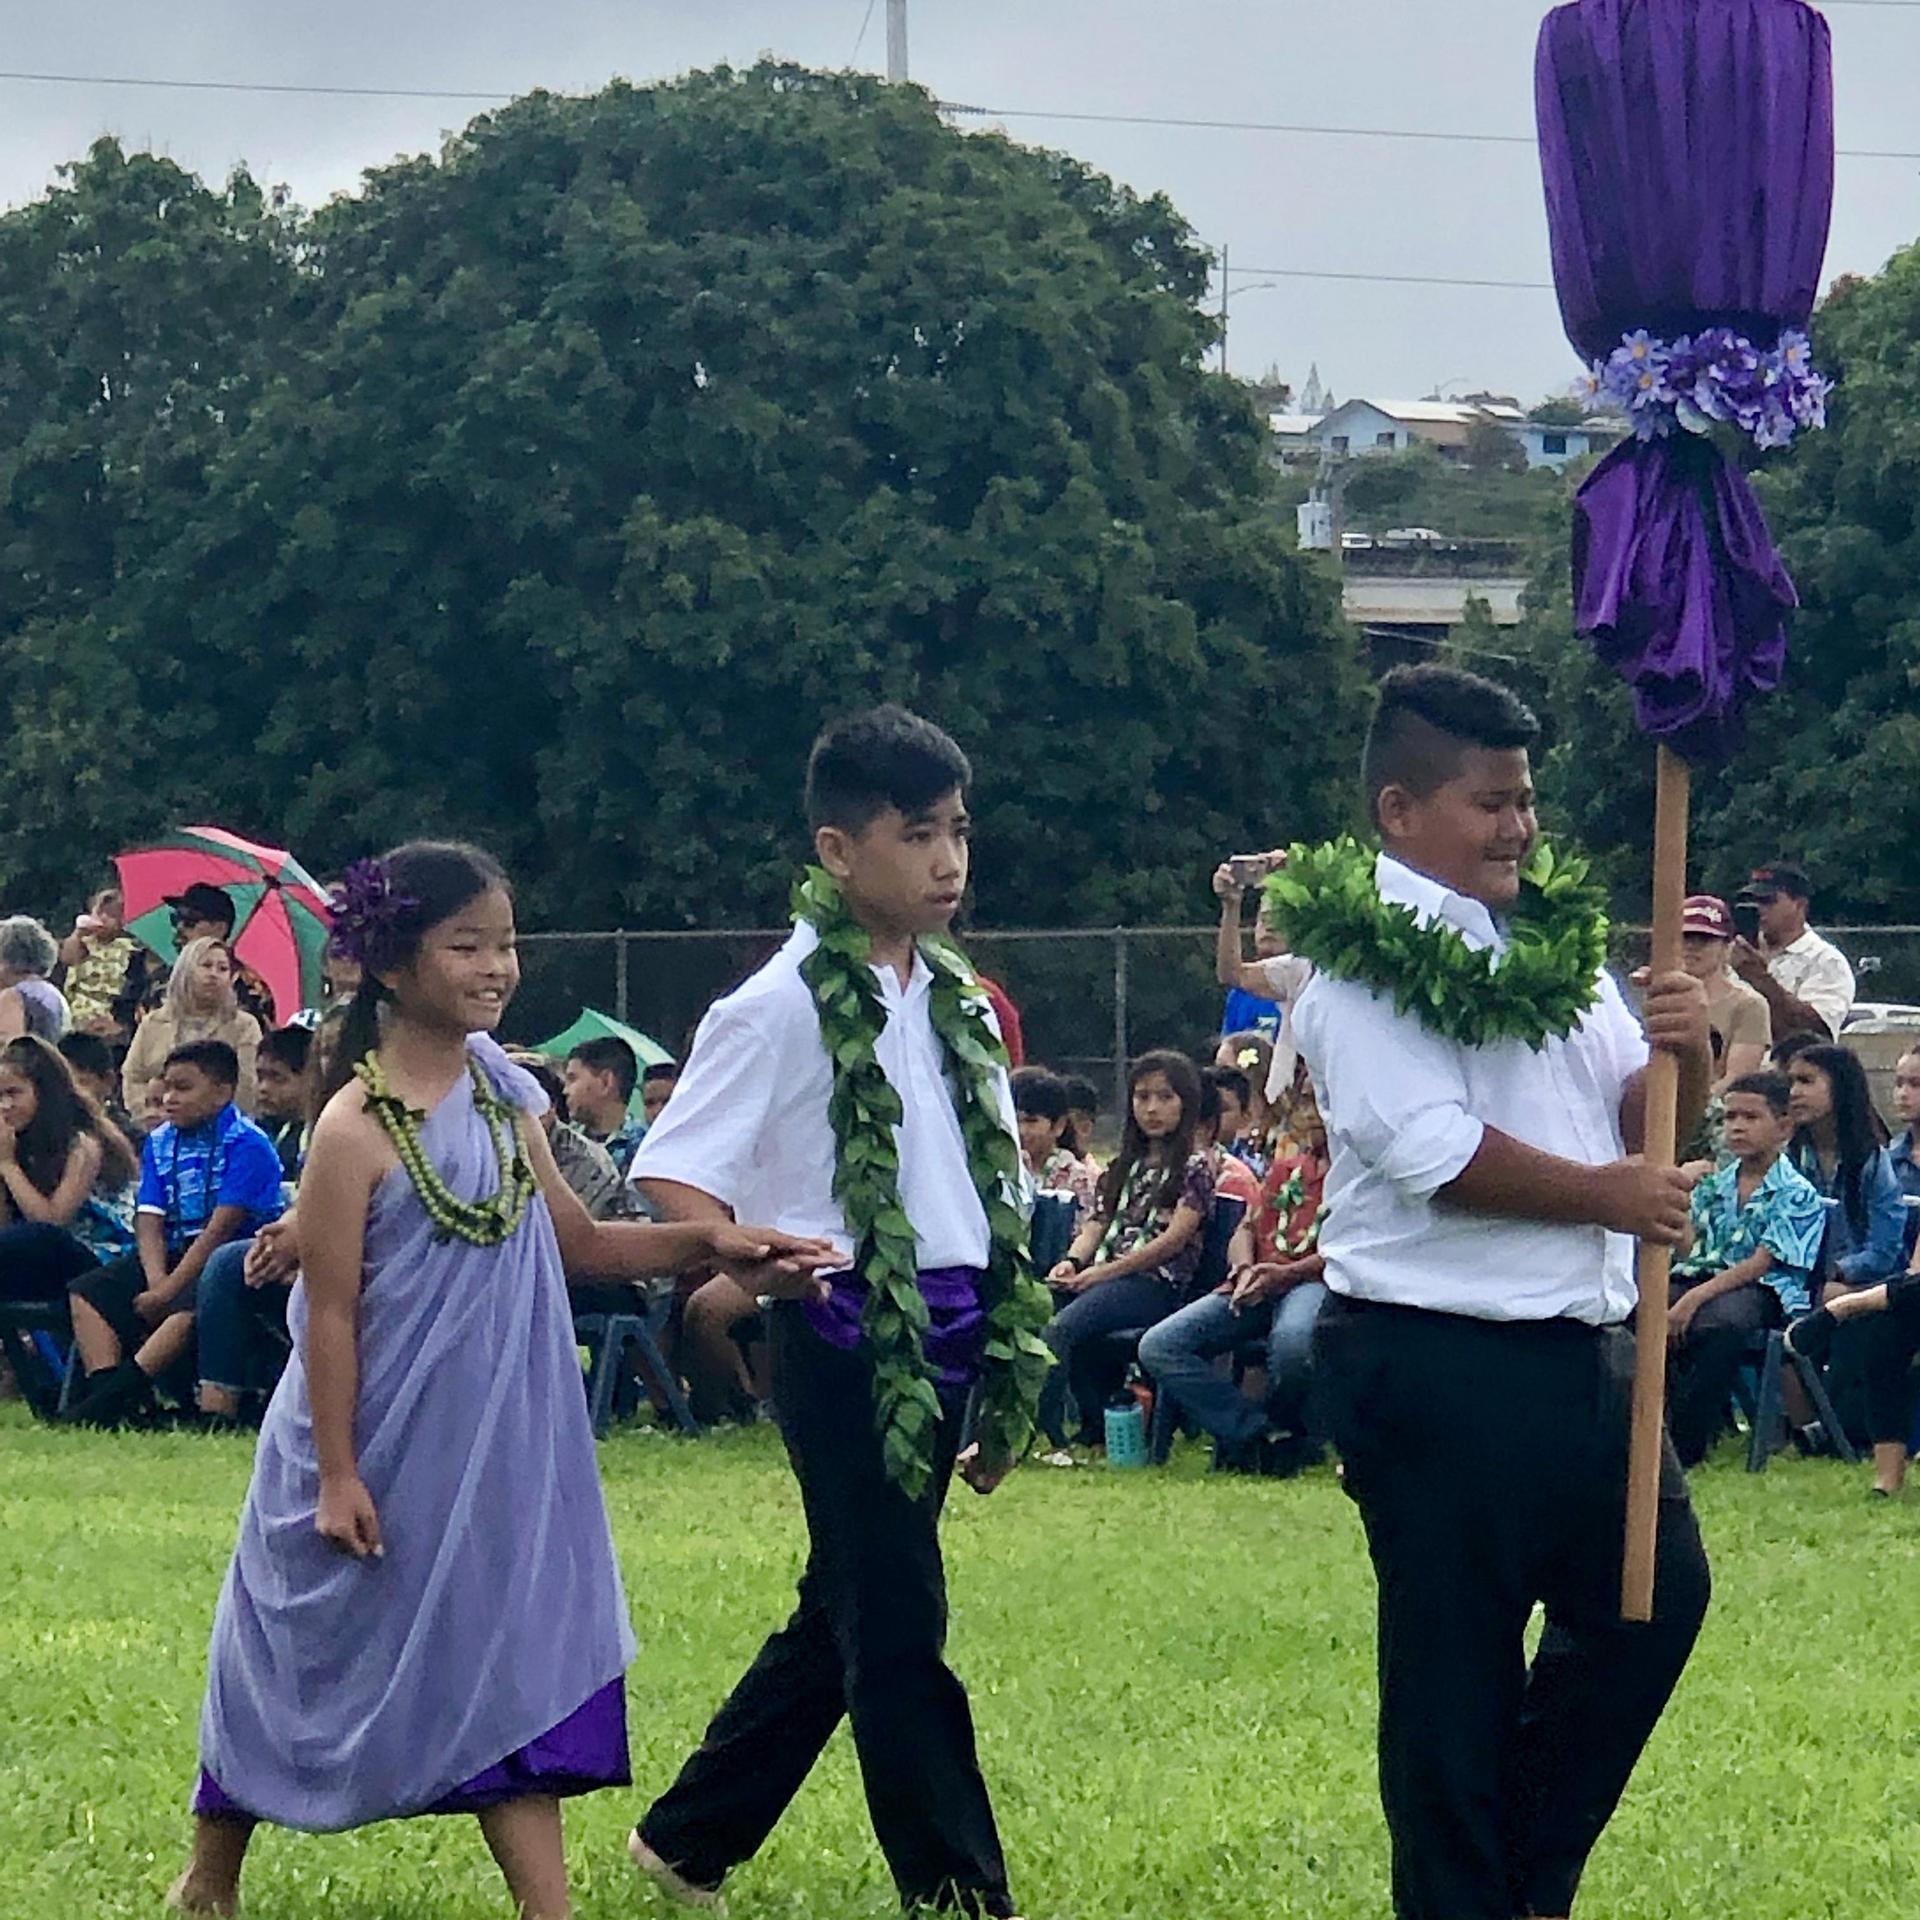 Kauai island princess and escort